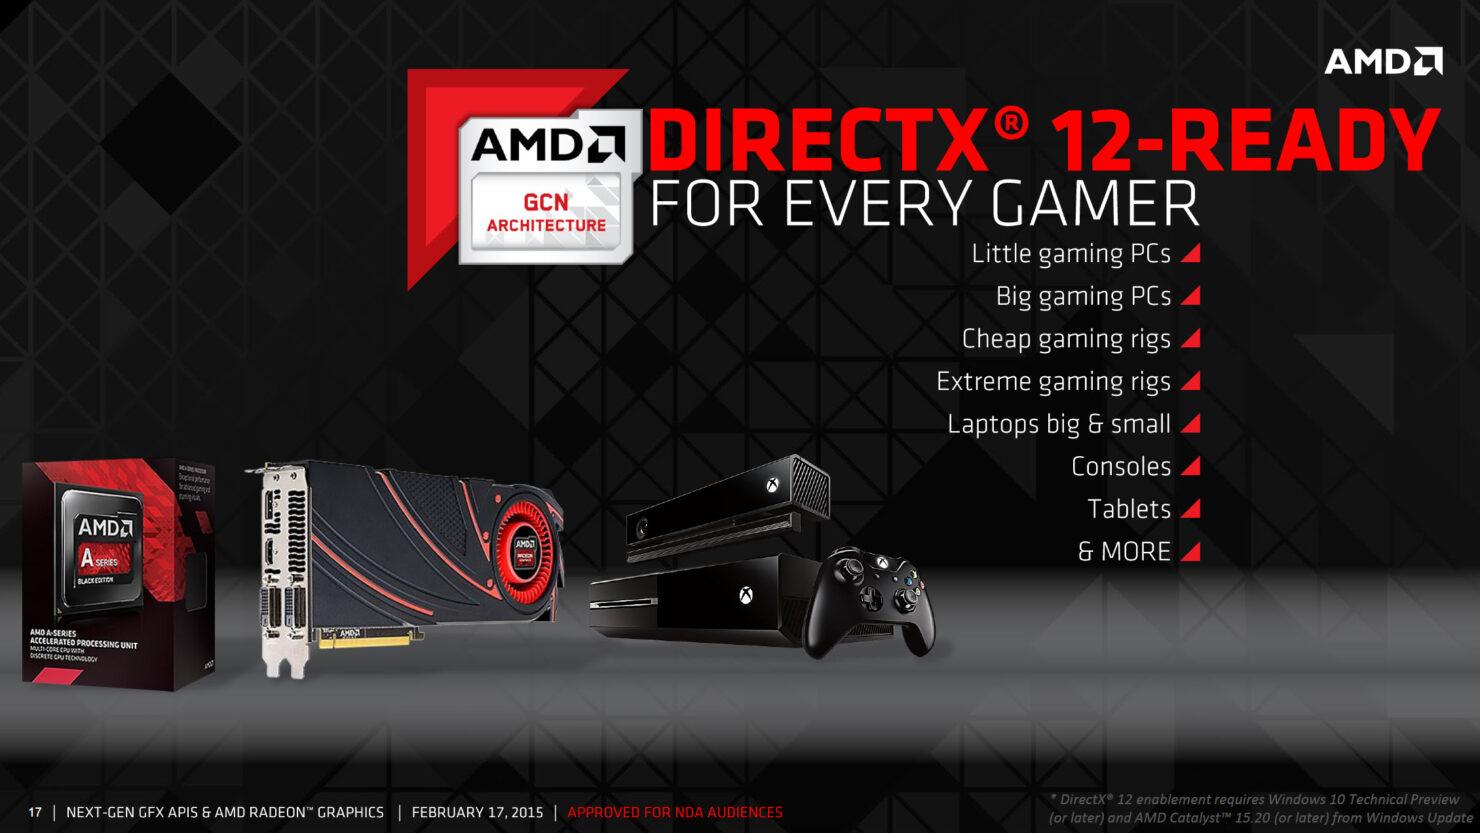 amd-directx-12-ready-gcn-architecture